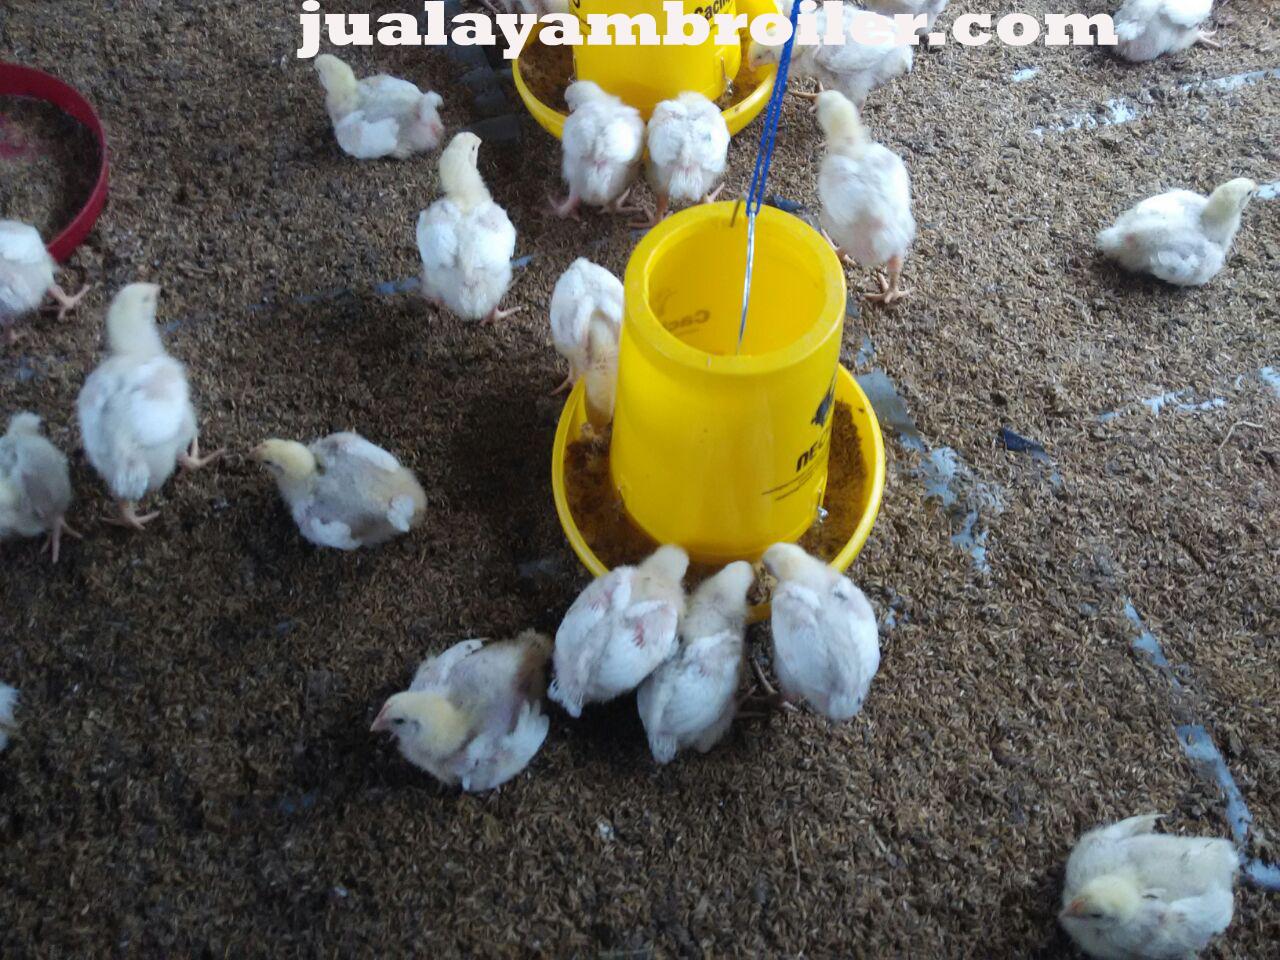 Jual Ayam Karkas Lubang Buaya Jakarta Timur